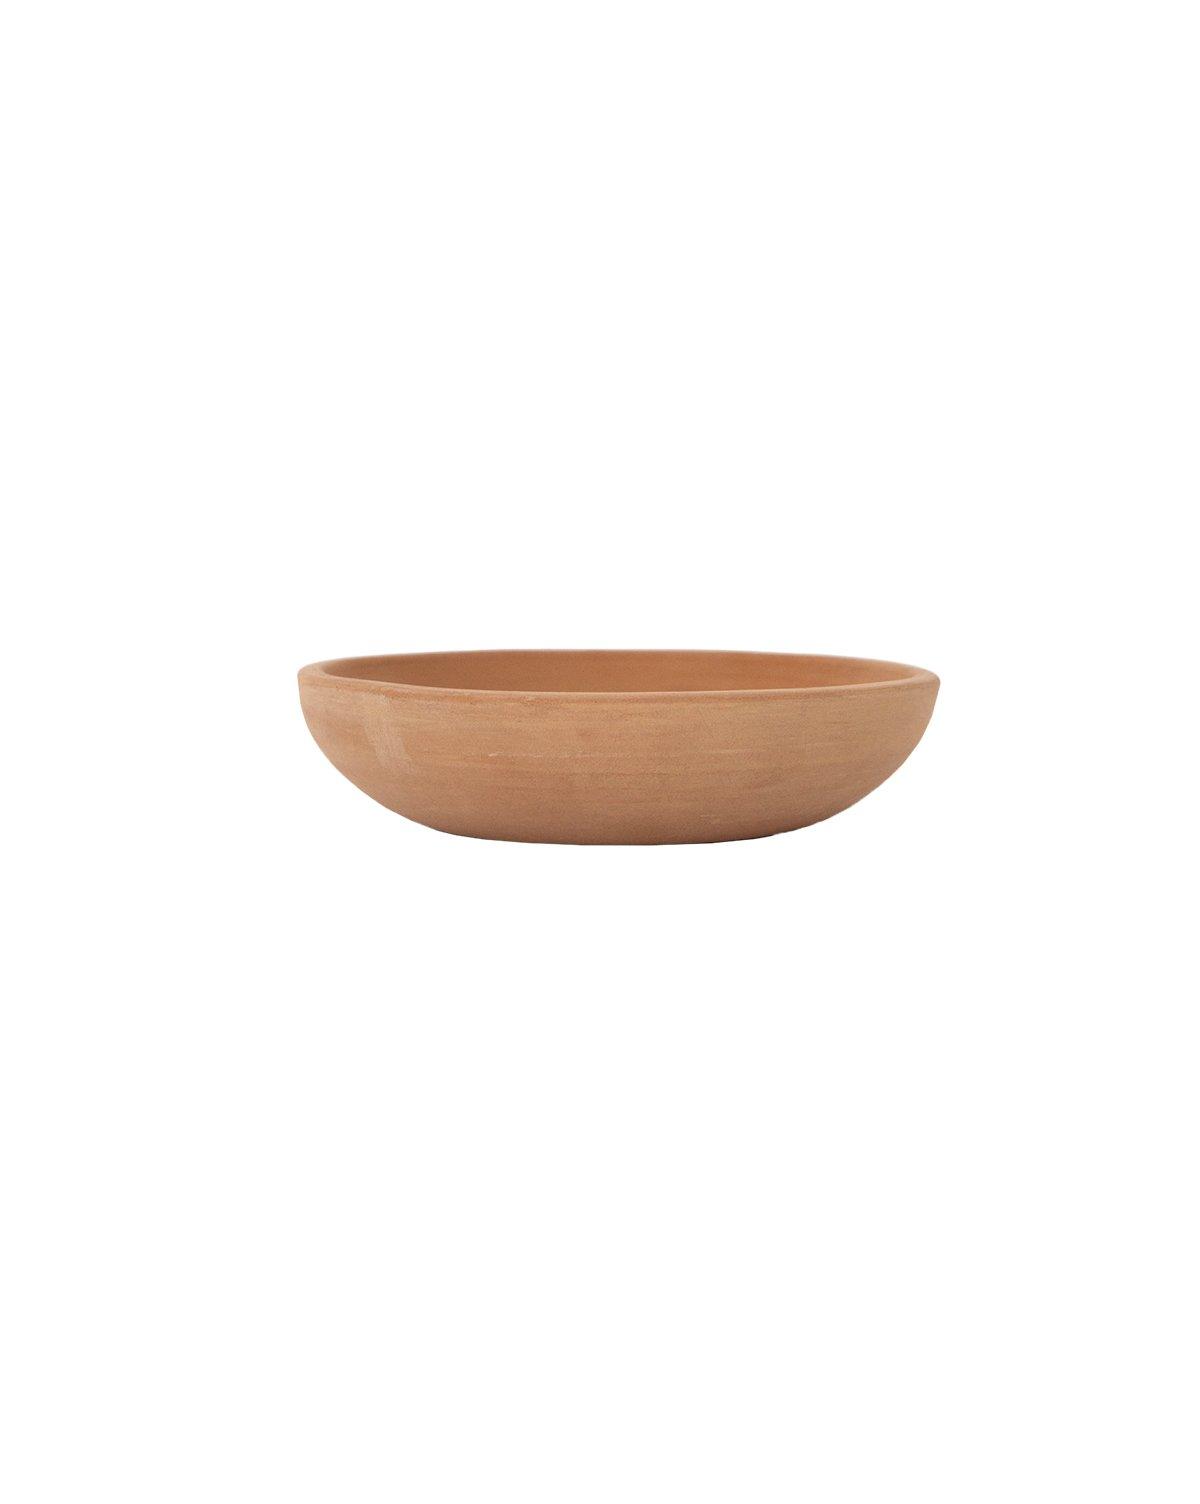 Low_Terracotta_Bowl3.jpg